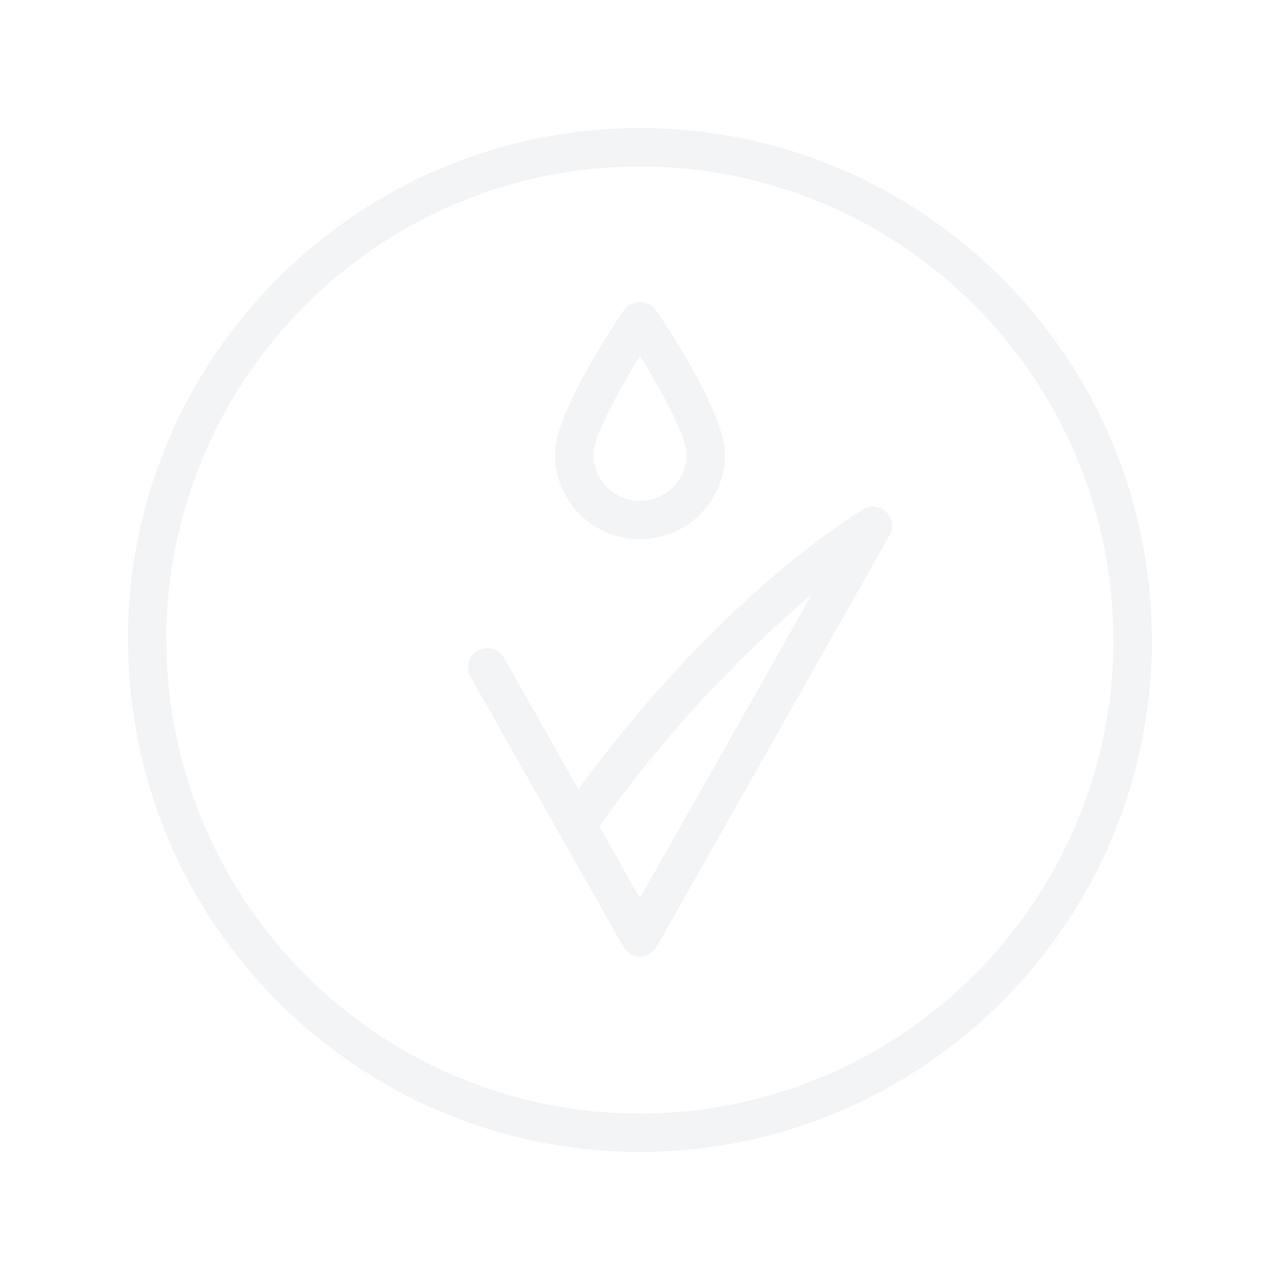 BIOKAP Nutricolor 5.3 Light Golden Brown Permanent Hair Dye 140ml